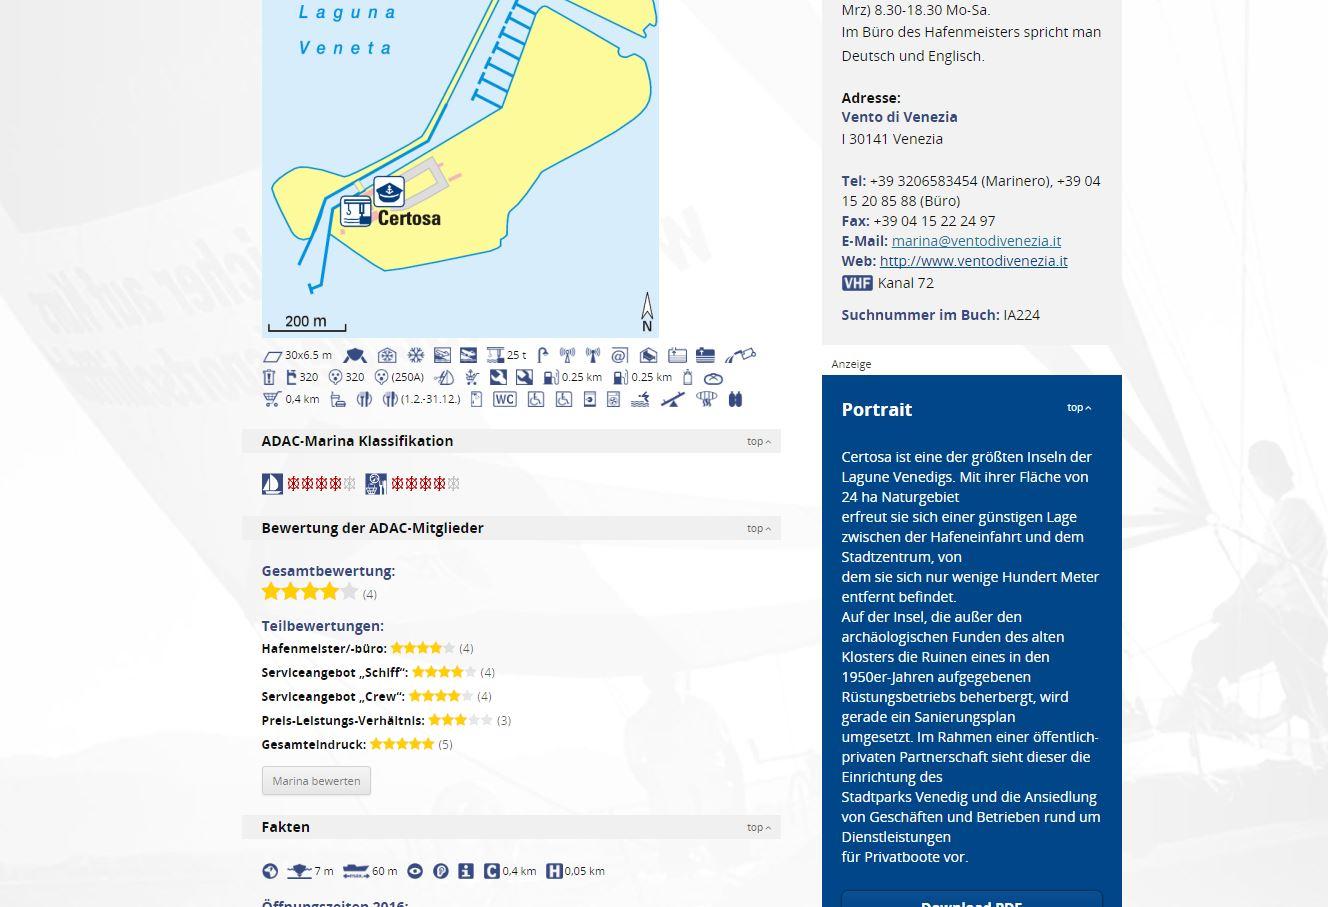 ADAC Marina-Portal erweitert seinen Service